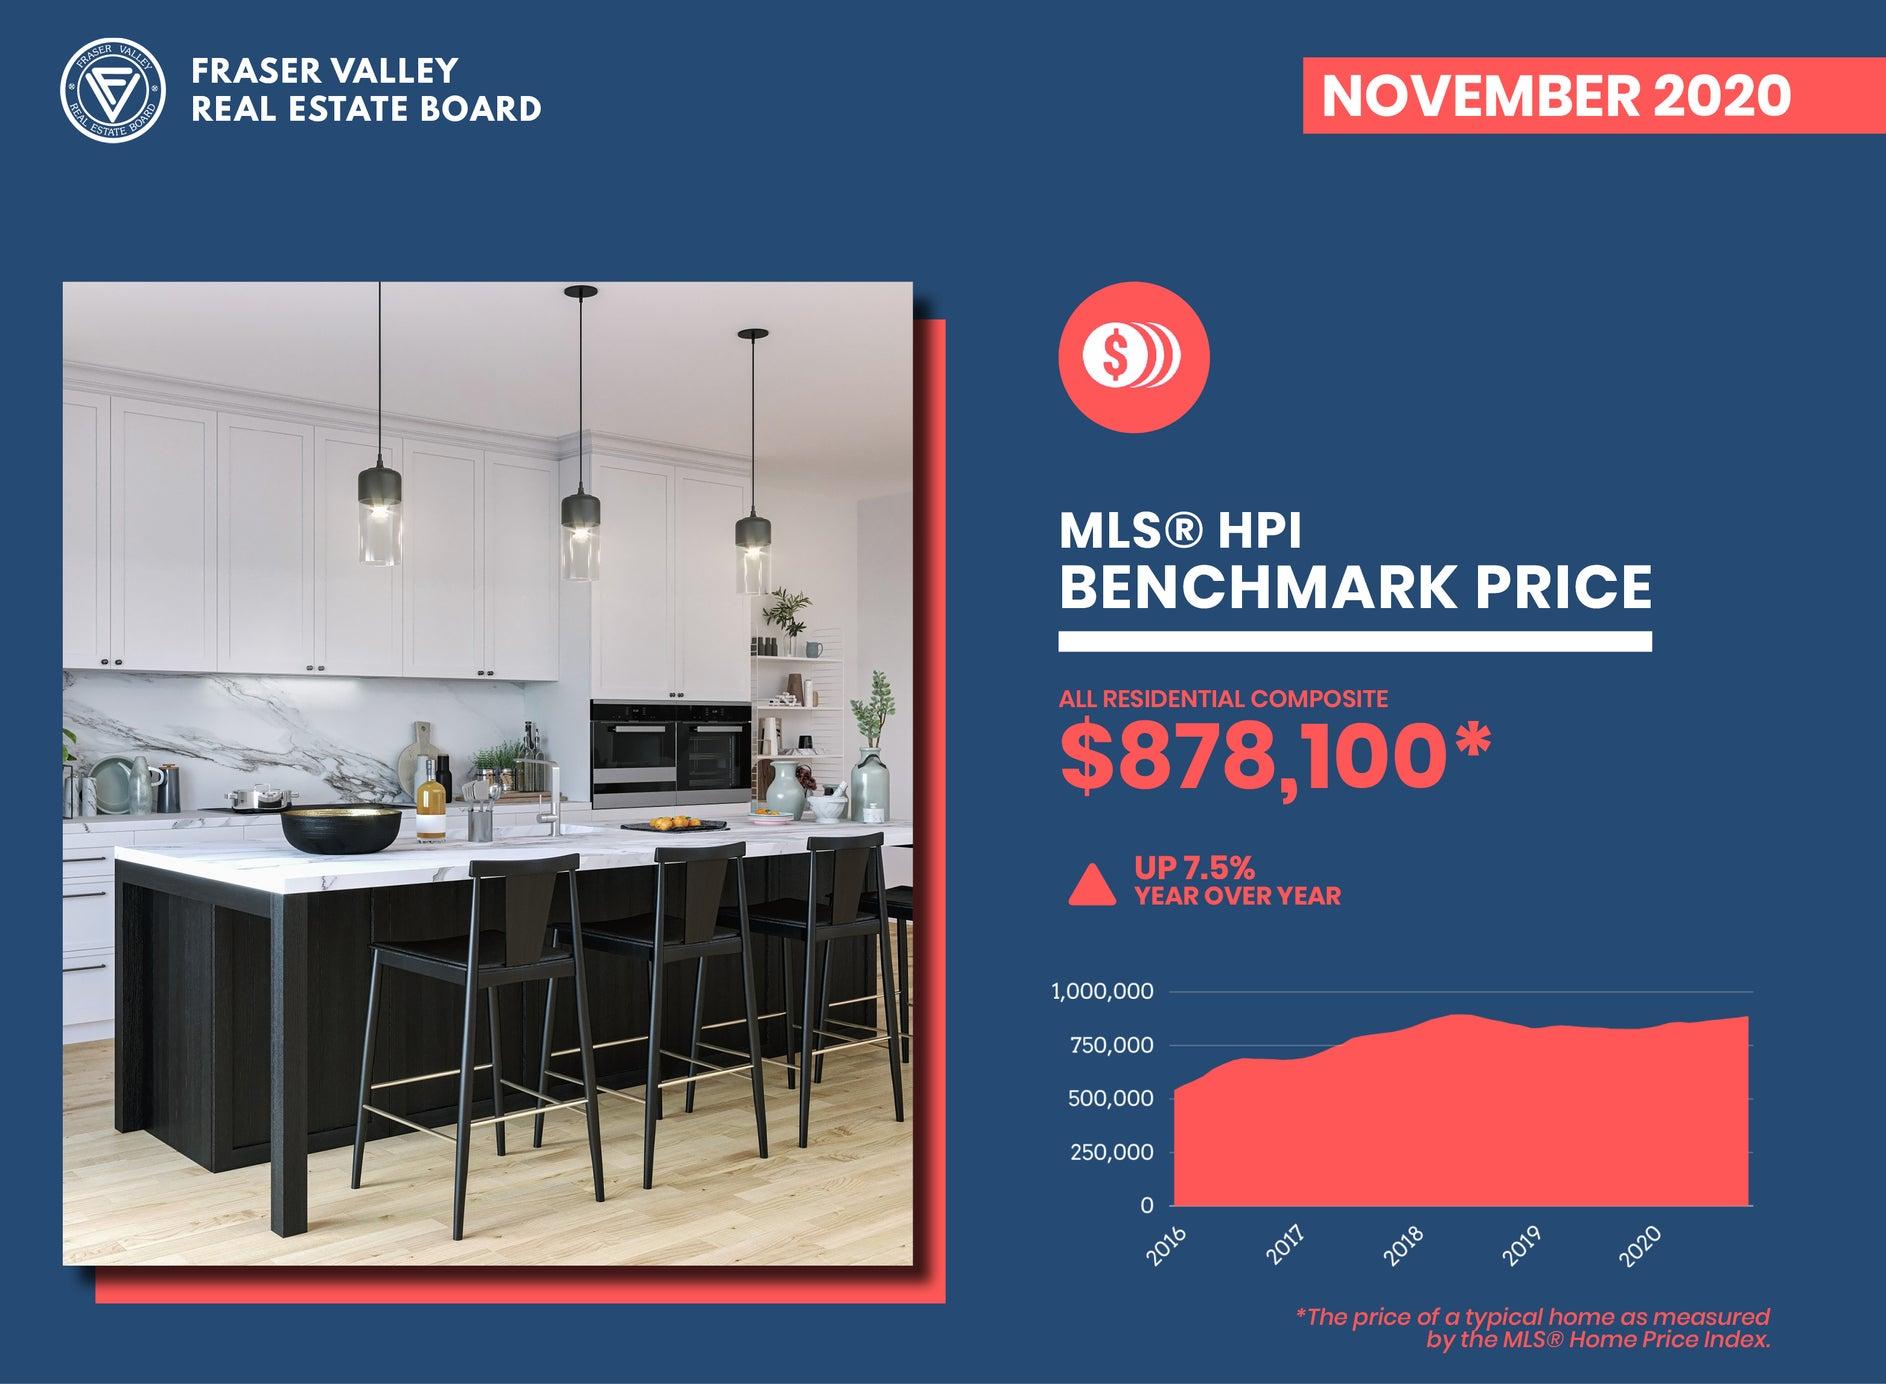 Fraser Valley Real Estate Market Report November 2020 – Benchmark Price